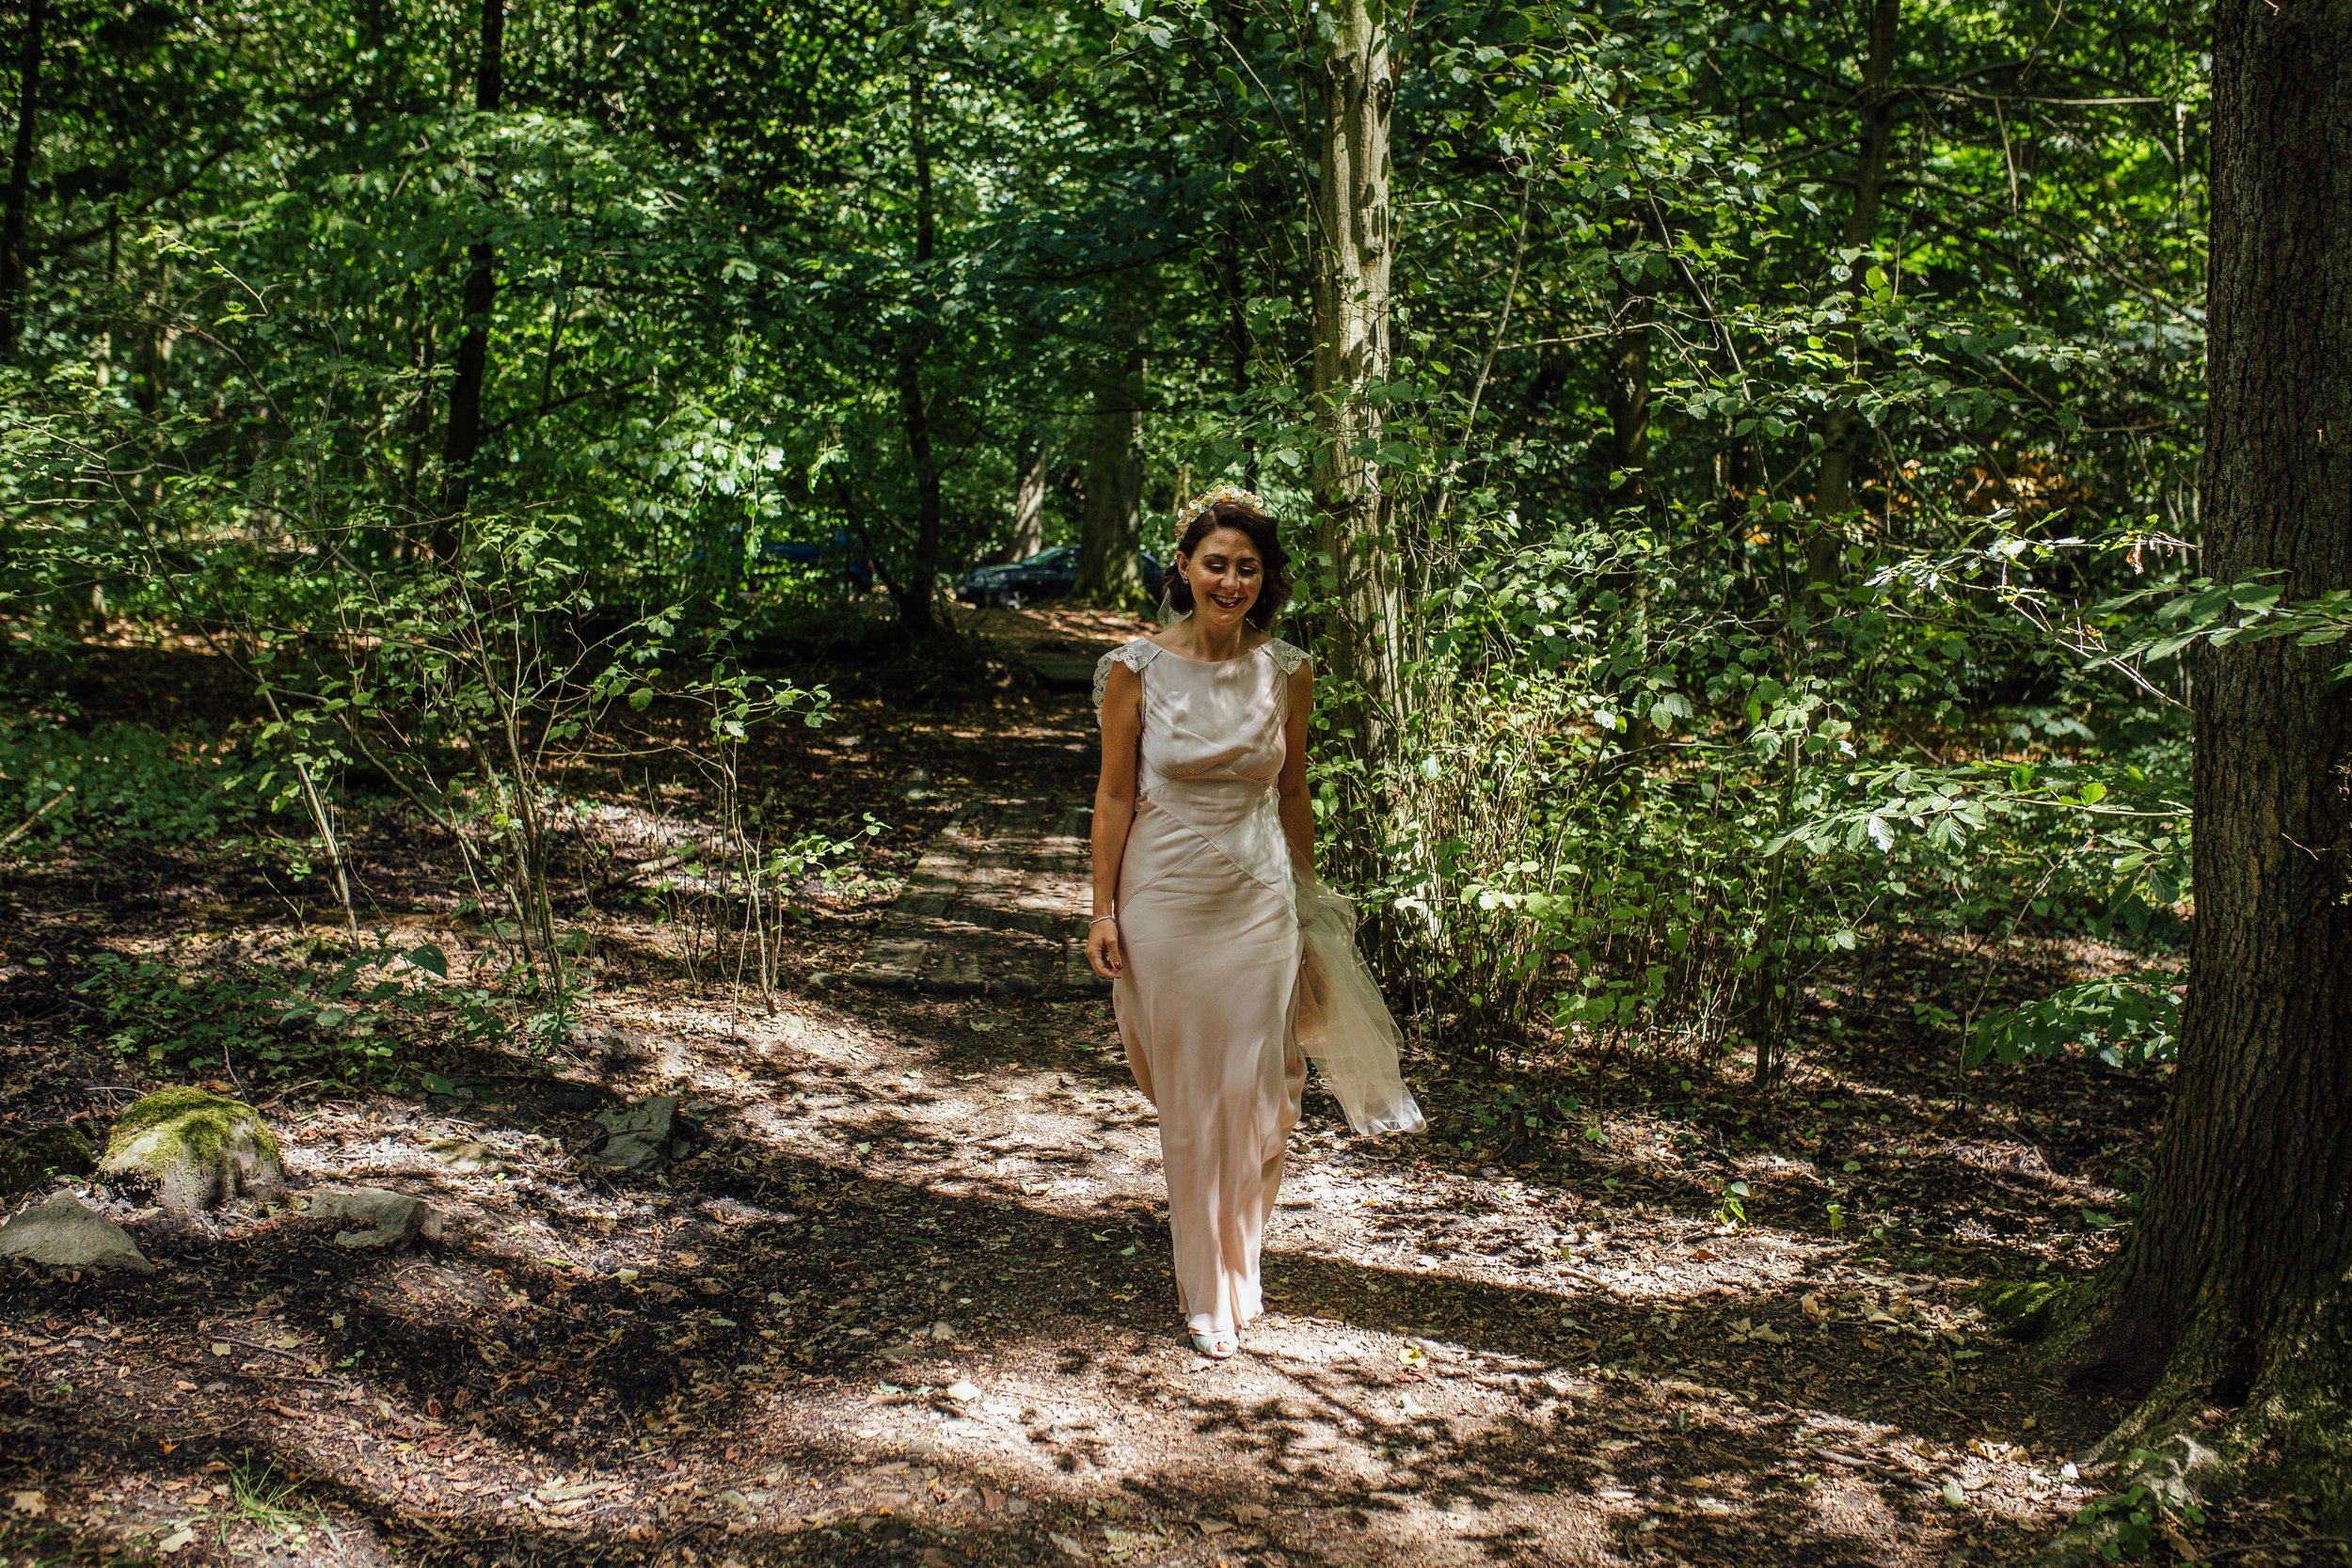 Katy-Bespoke-Veil-Sheffield-Wedding-Wes-Anderson-Susanna-Greening-Derbyshire-4